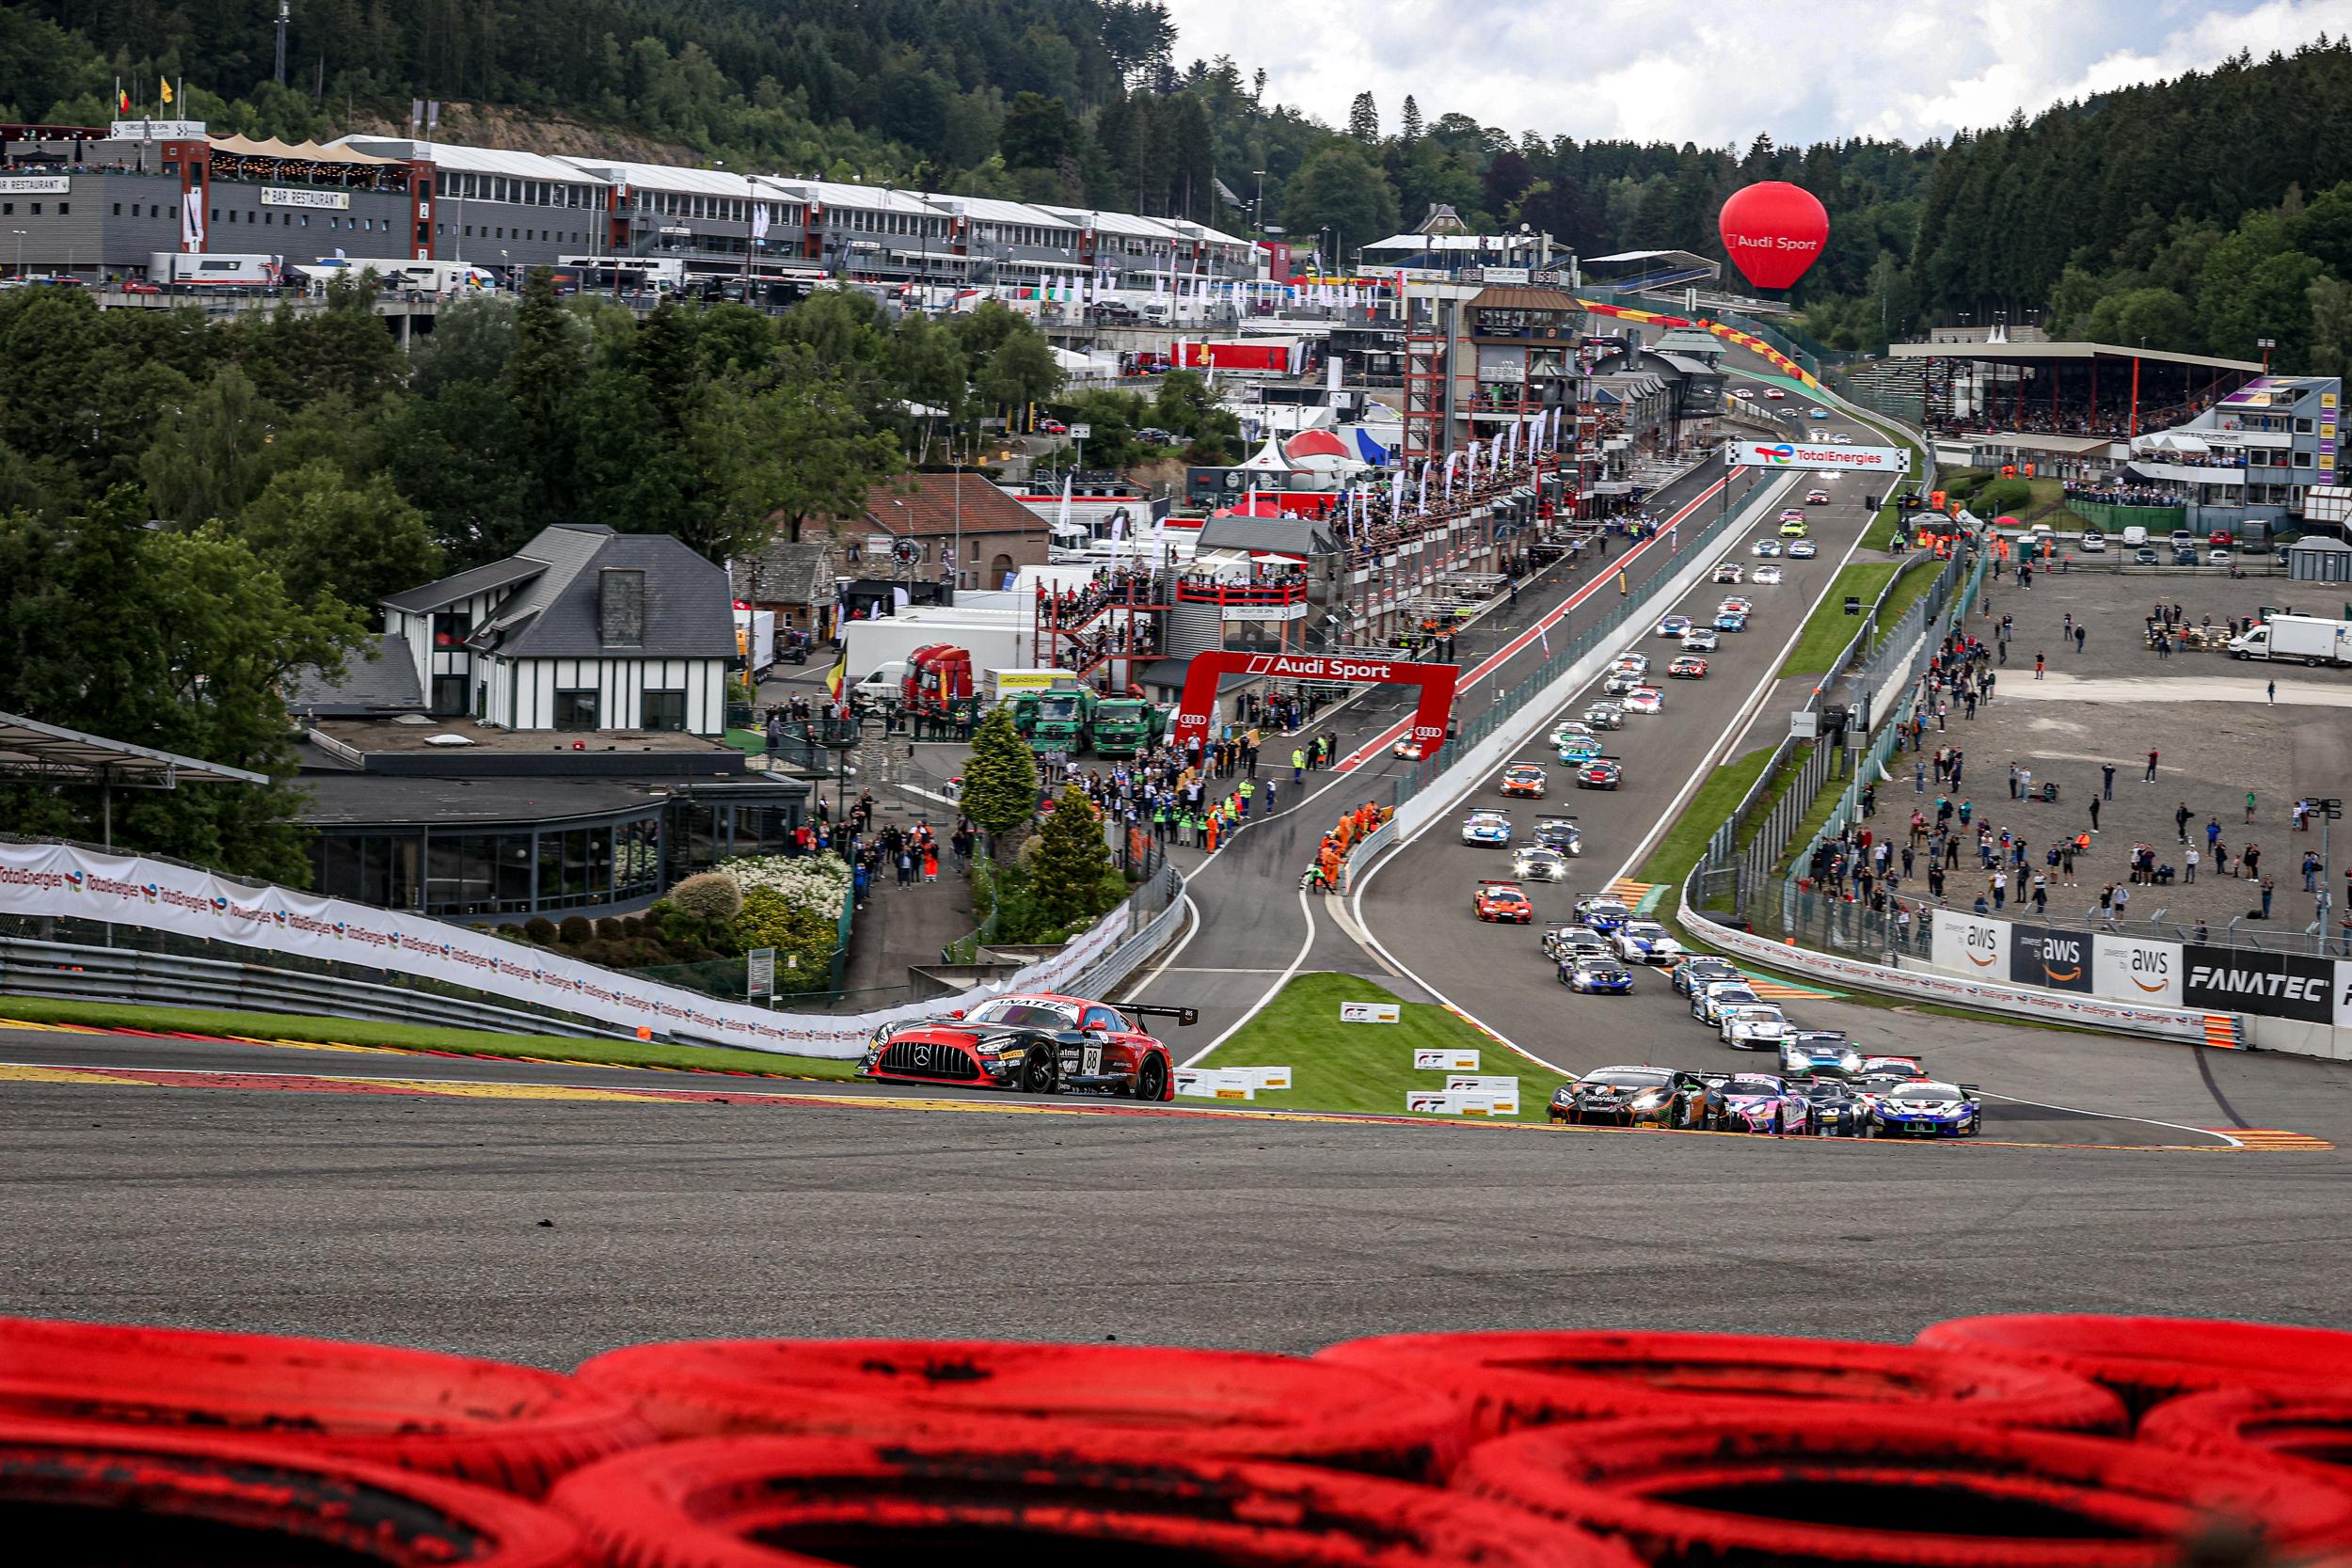 24h Spa Start Race-Fanatec GT World Challenge-Spa Francorchamps